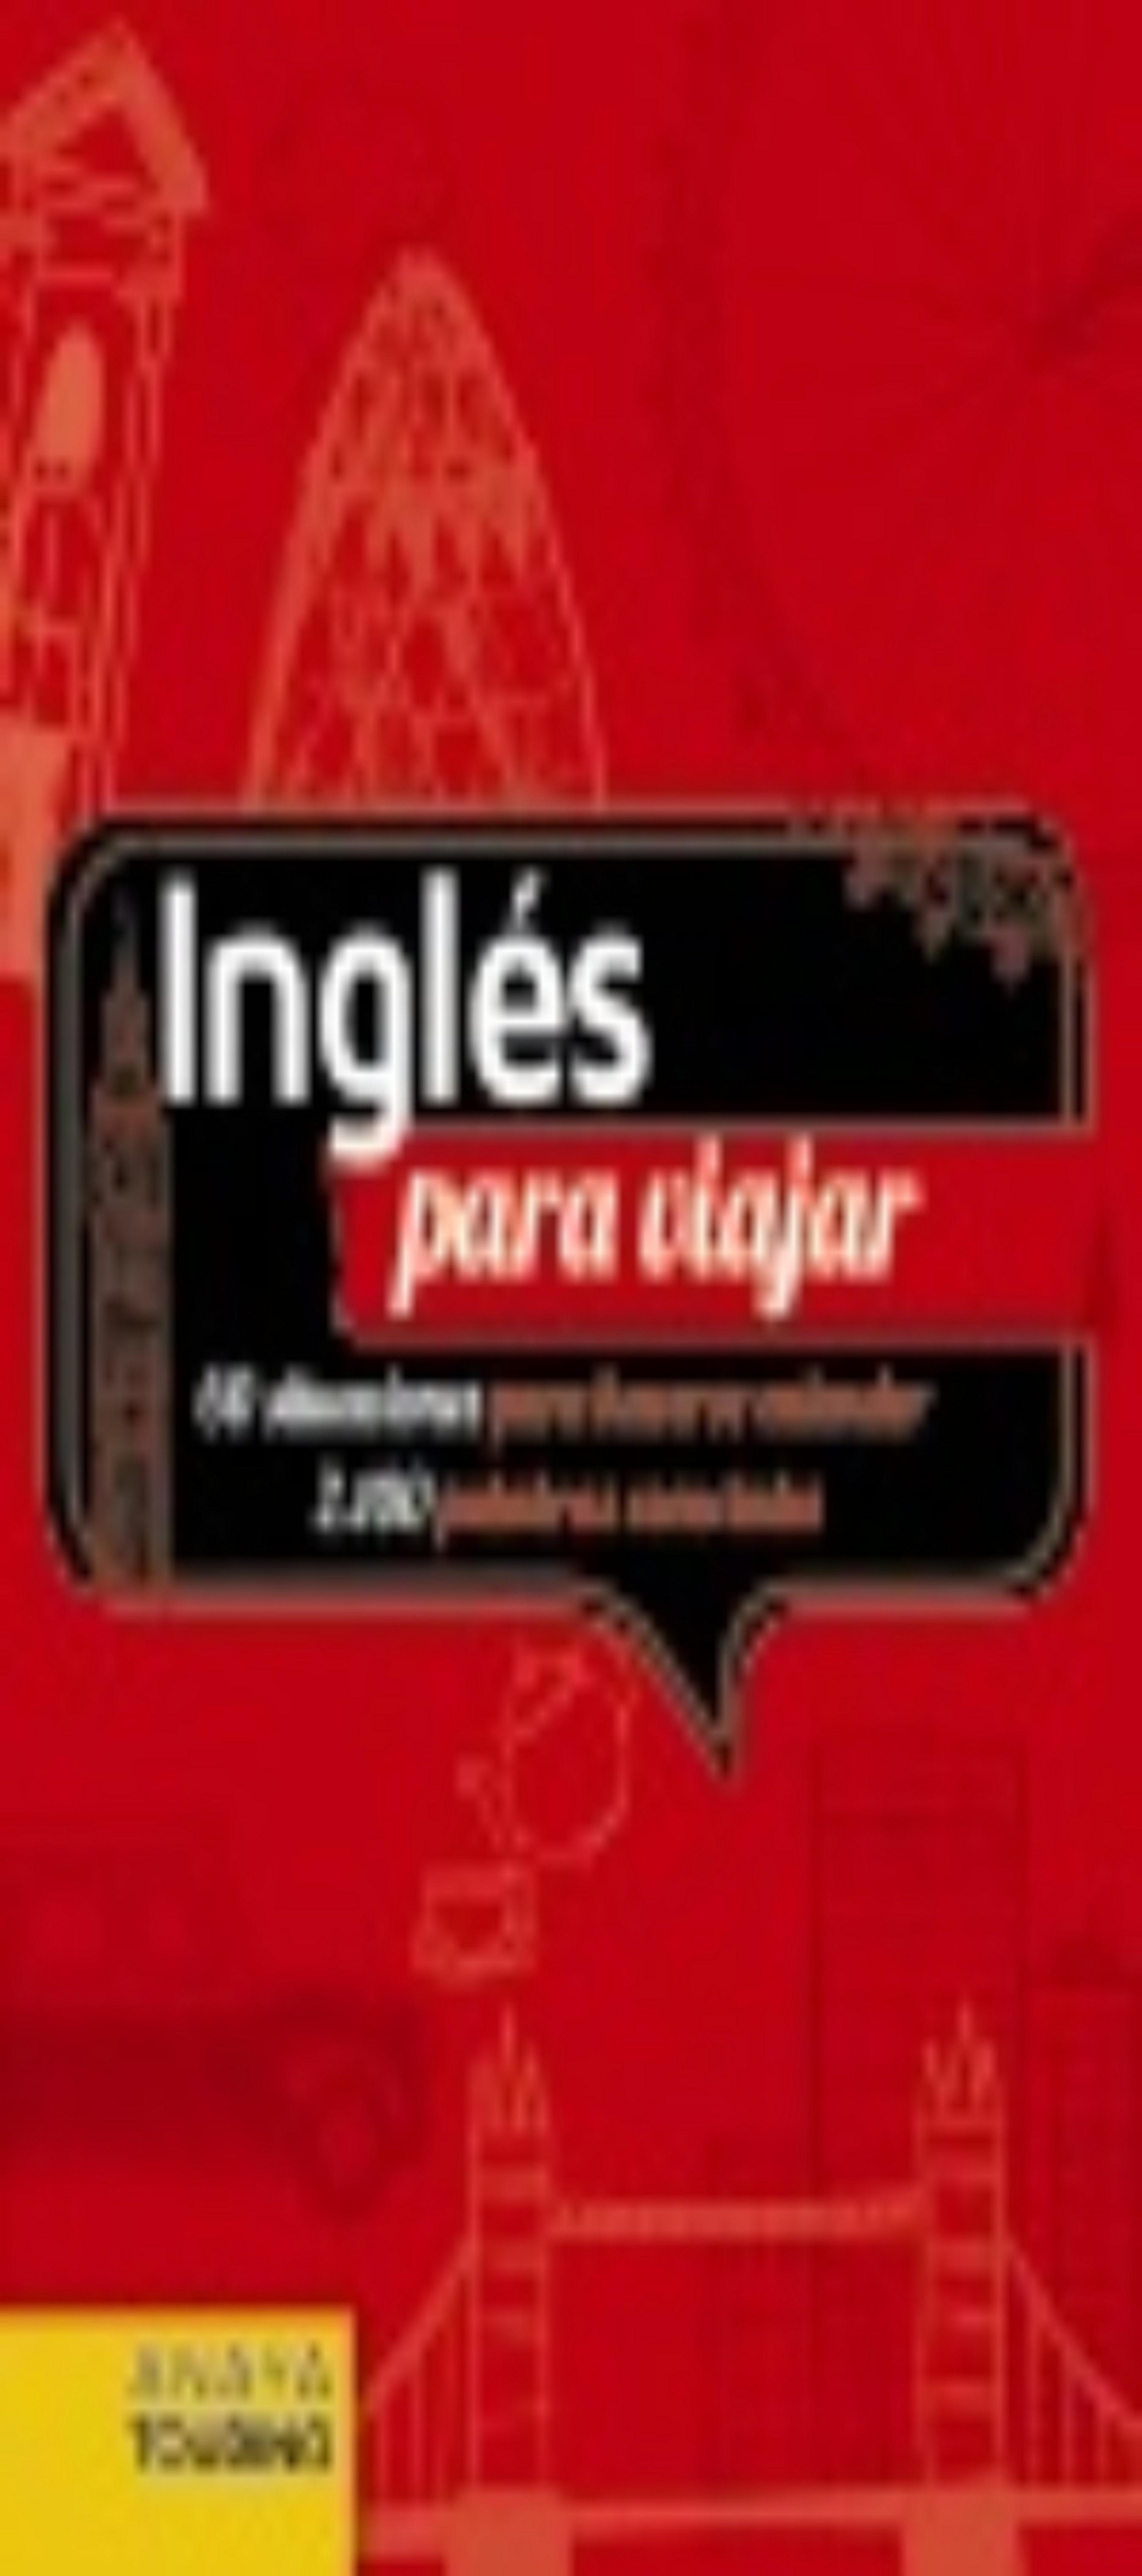 INGLES PARA VIAJAR - Anaya Touring Club